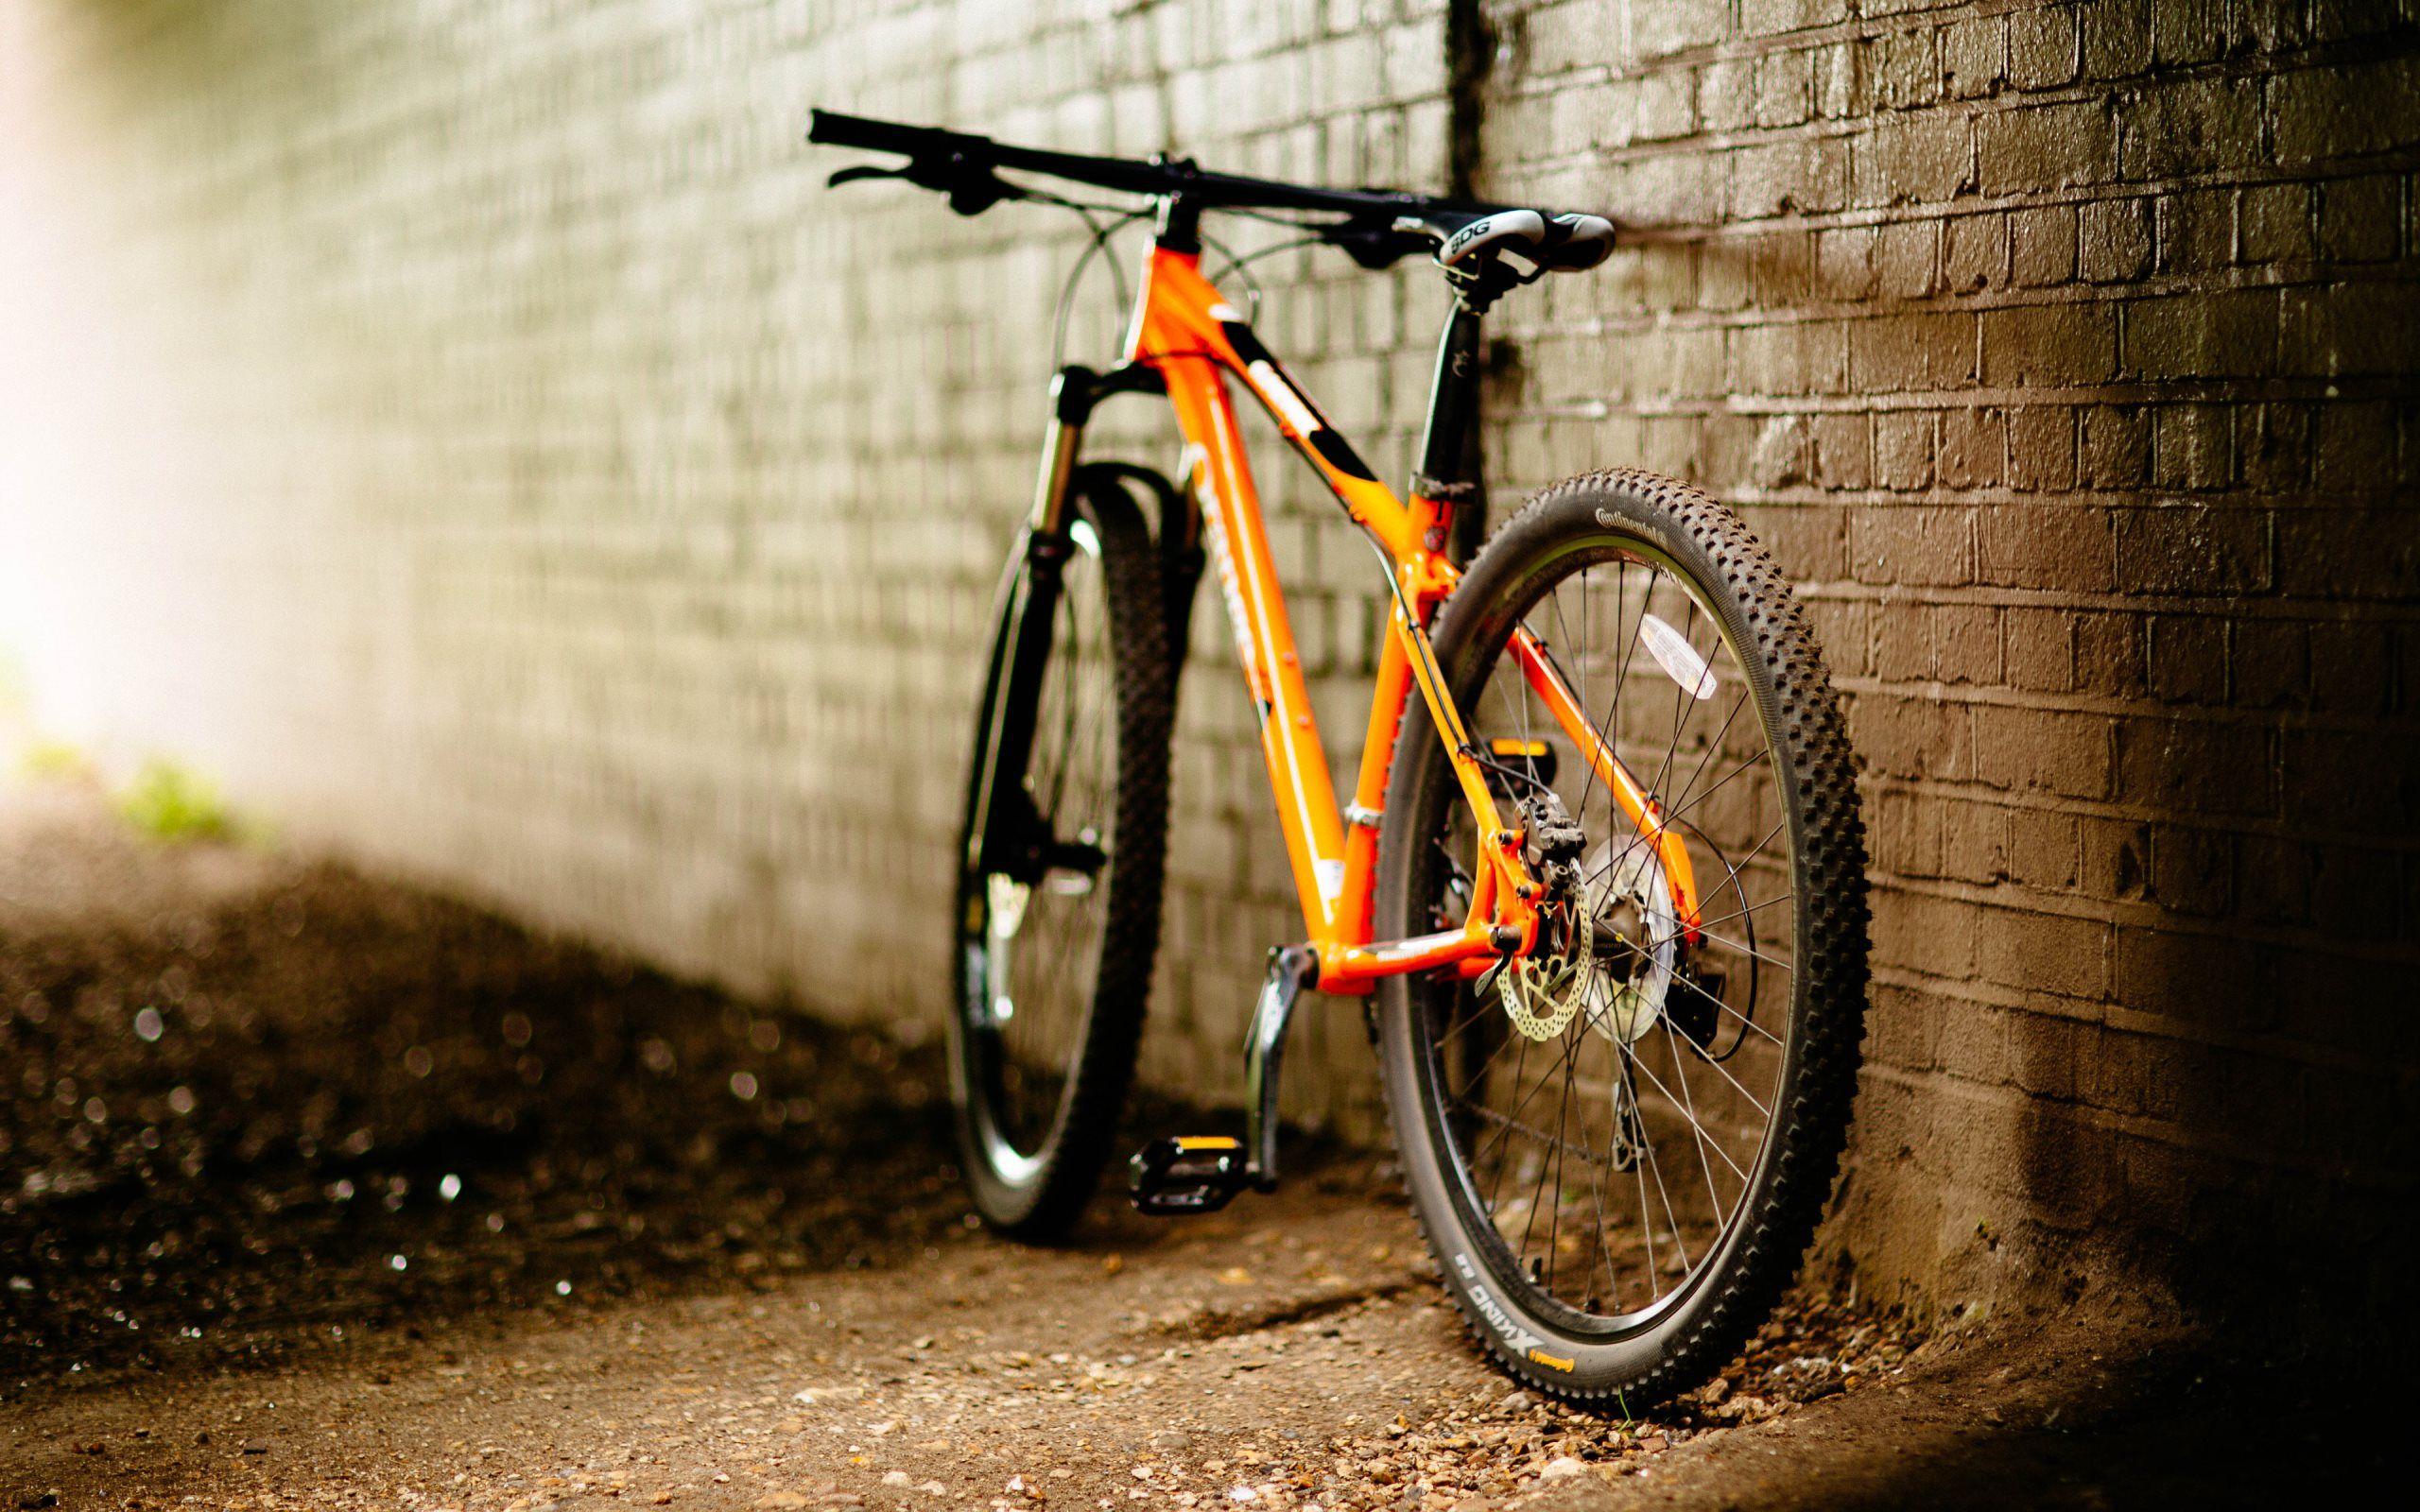 Mtb Desktop Wallpaper Google Search Bianchi Bicicletas Planos